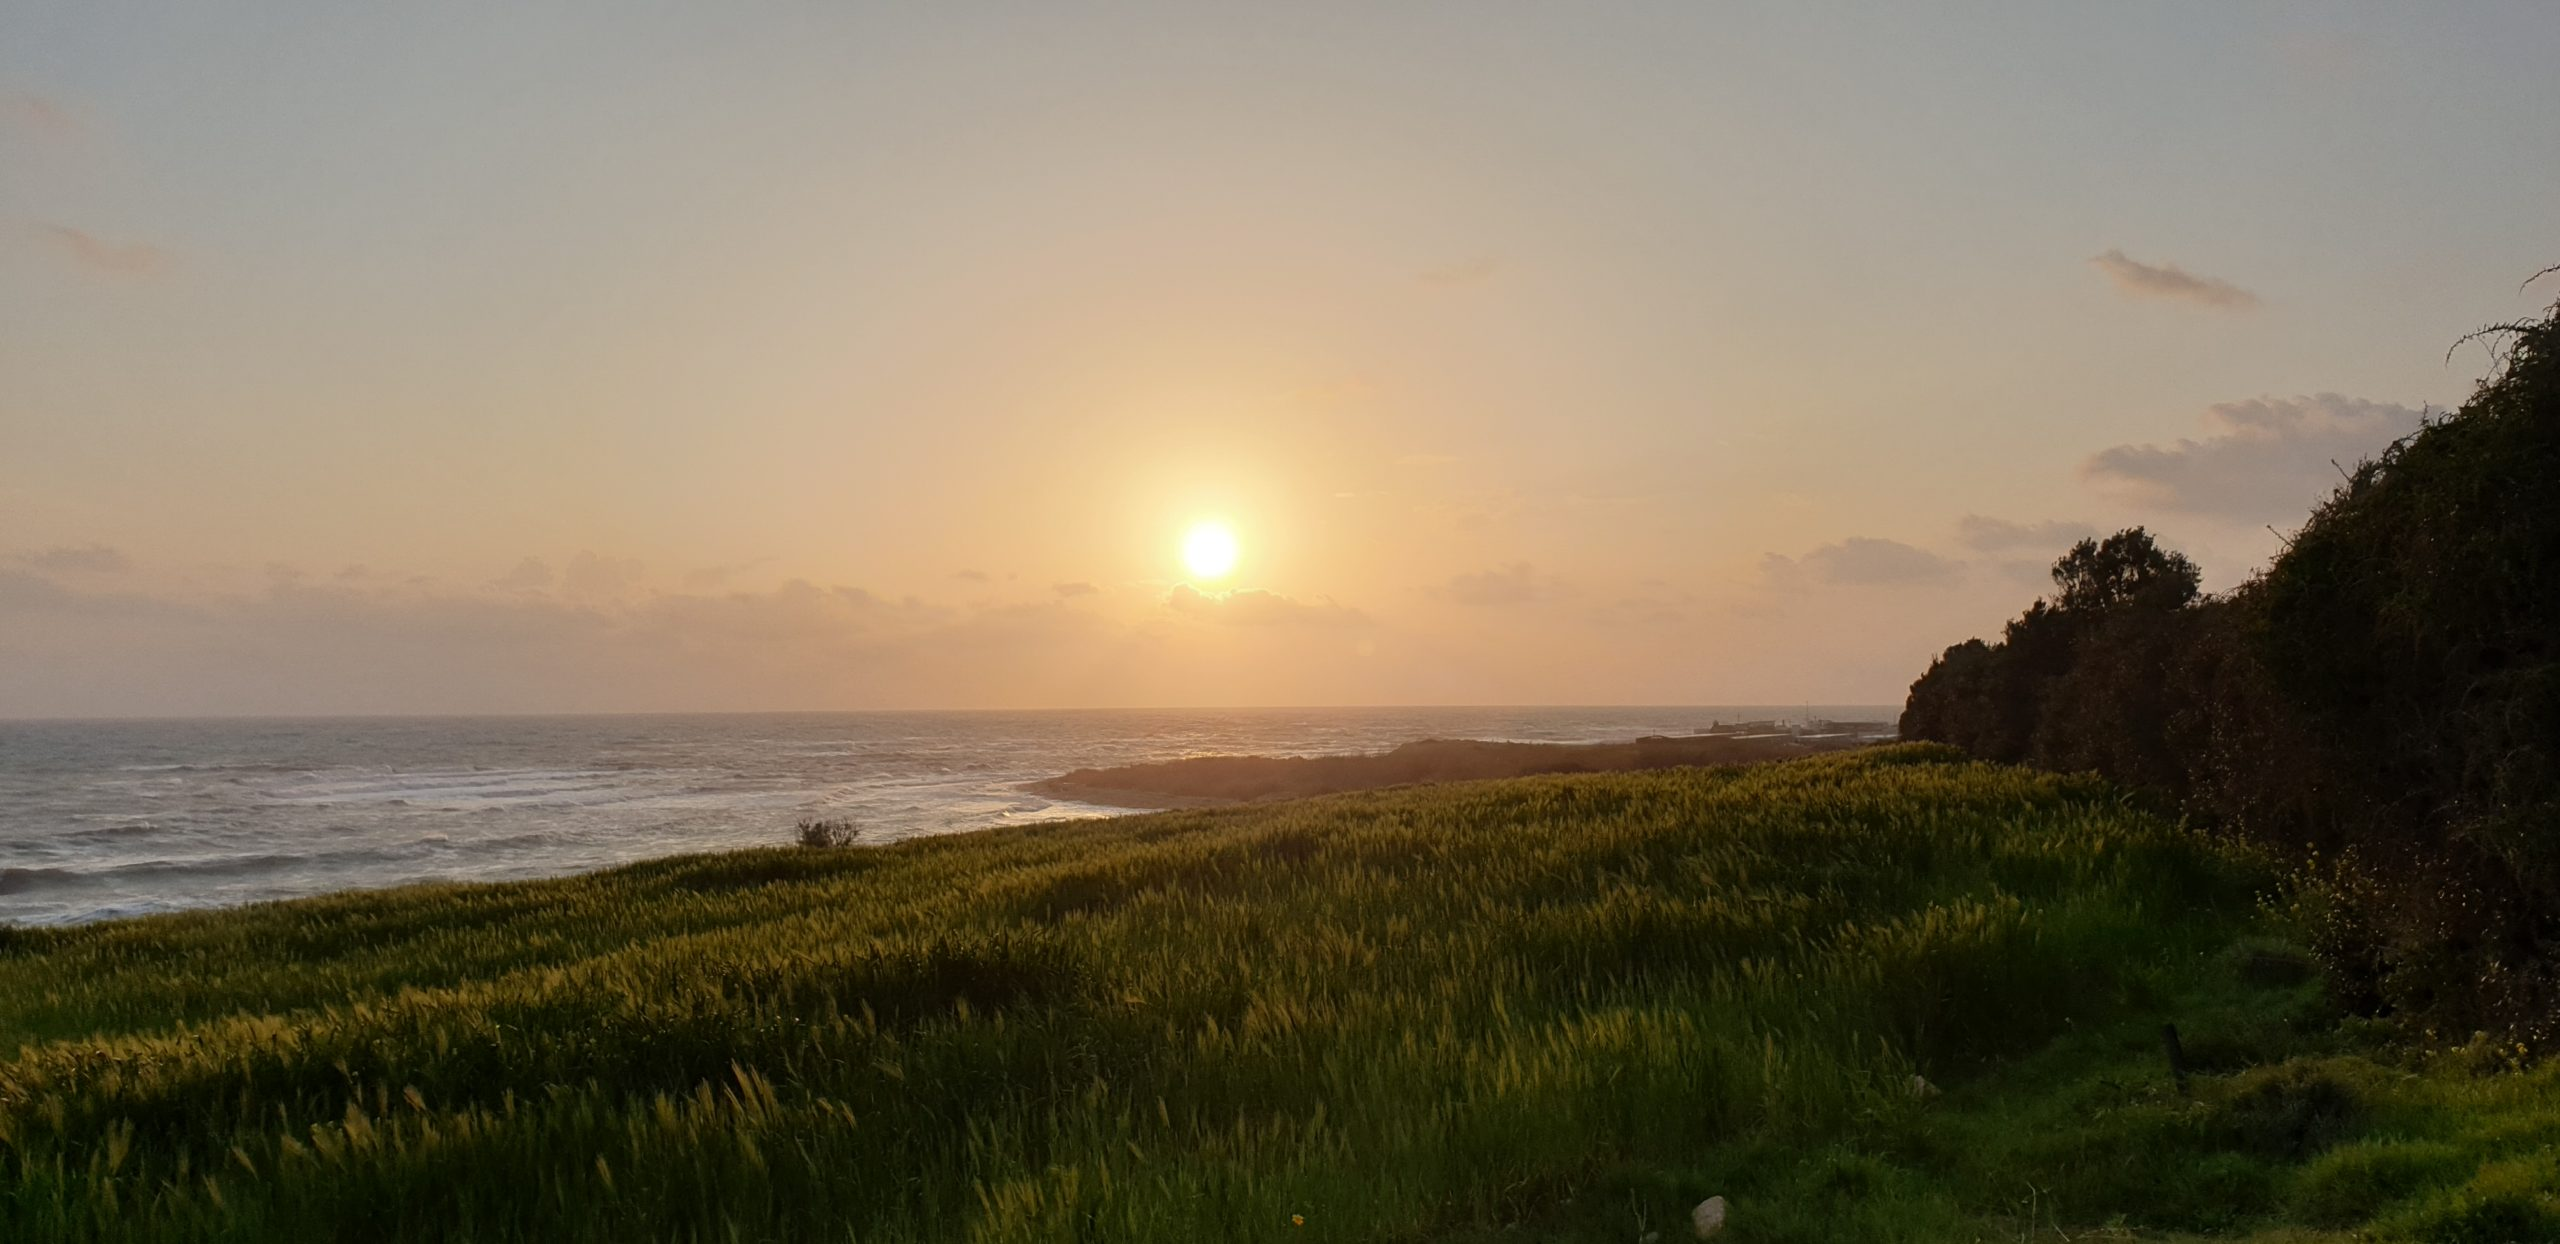 Sonnenuntergang auf Zypern in Februar